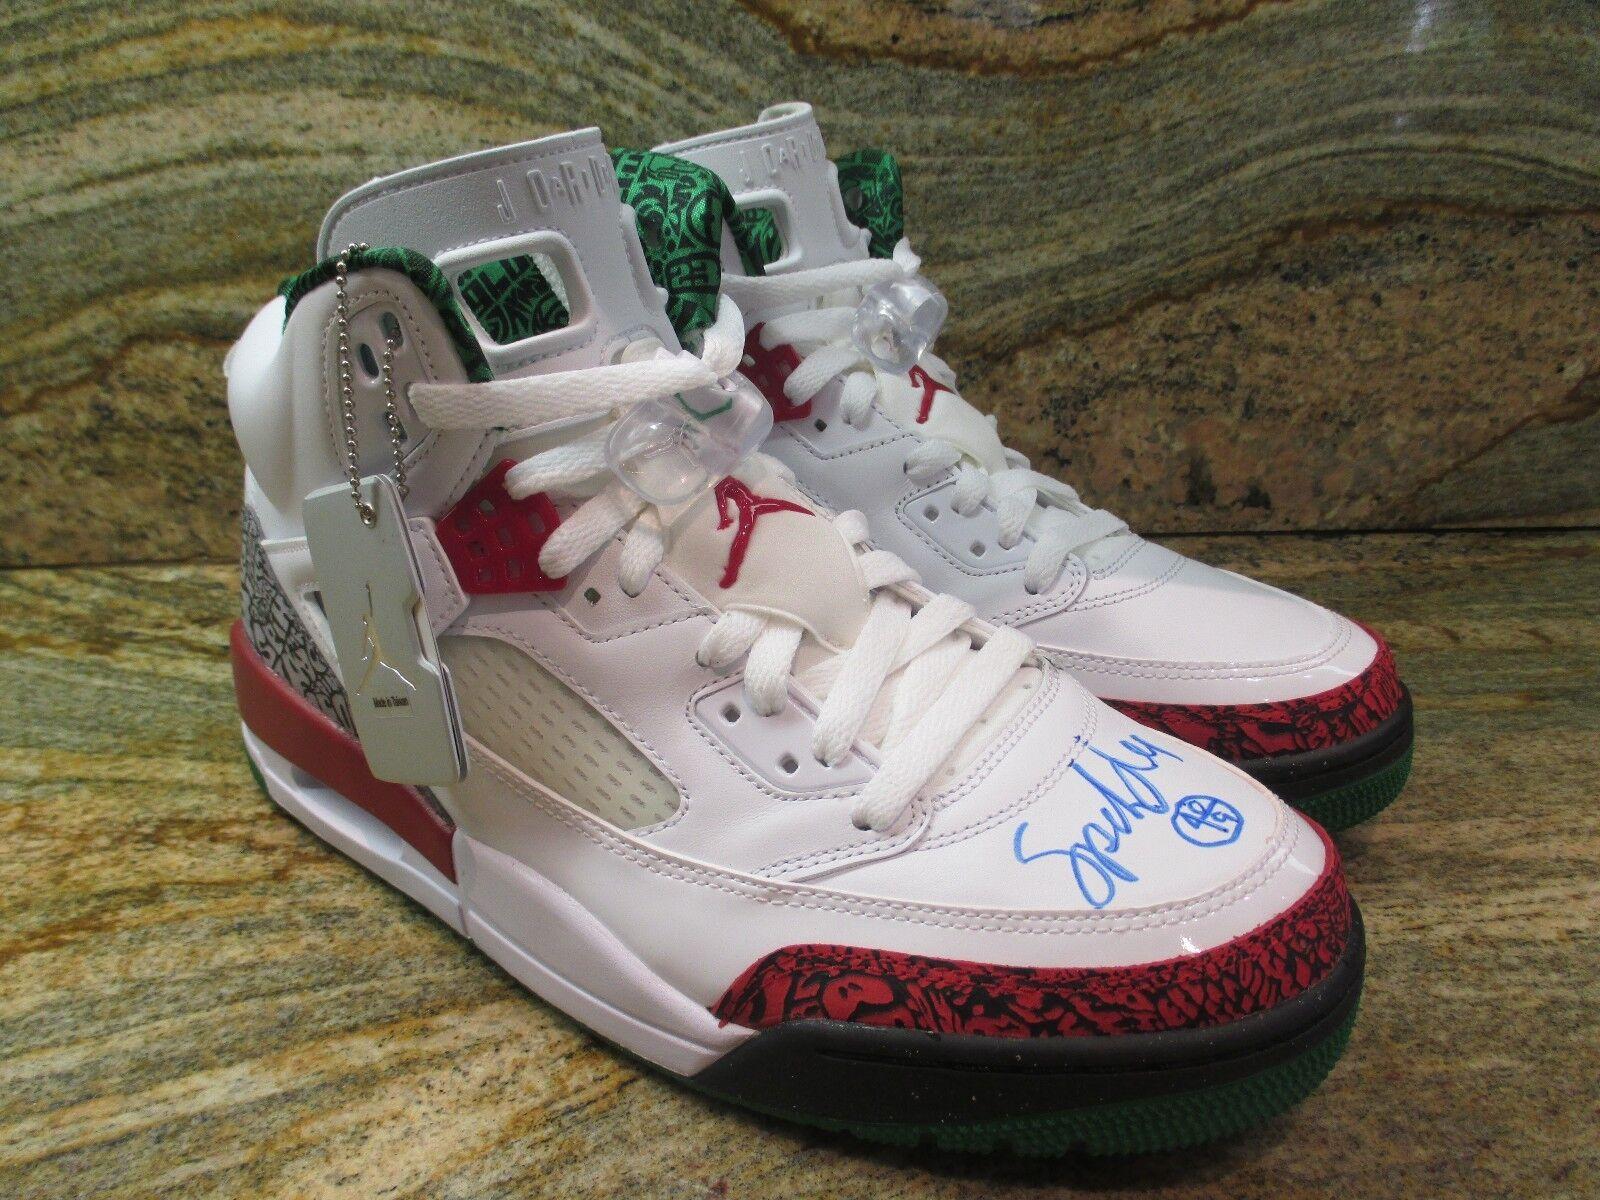 Nike Air Jordan Spizike Lee OG SZ 10 Spike Lee Spizike Autographed blanc Retro 315371-125 855d22